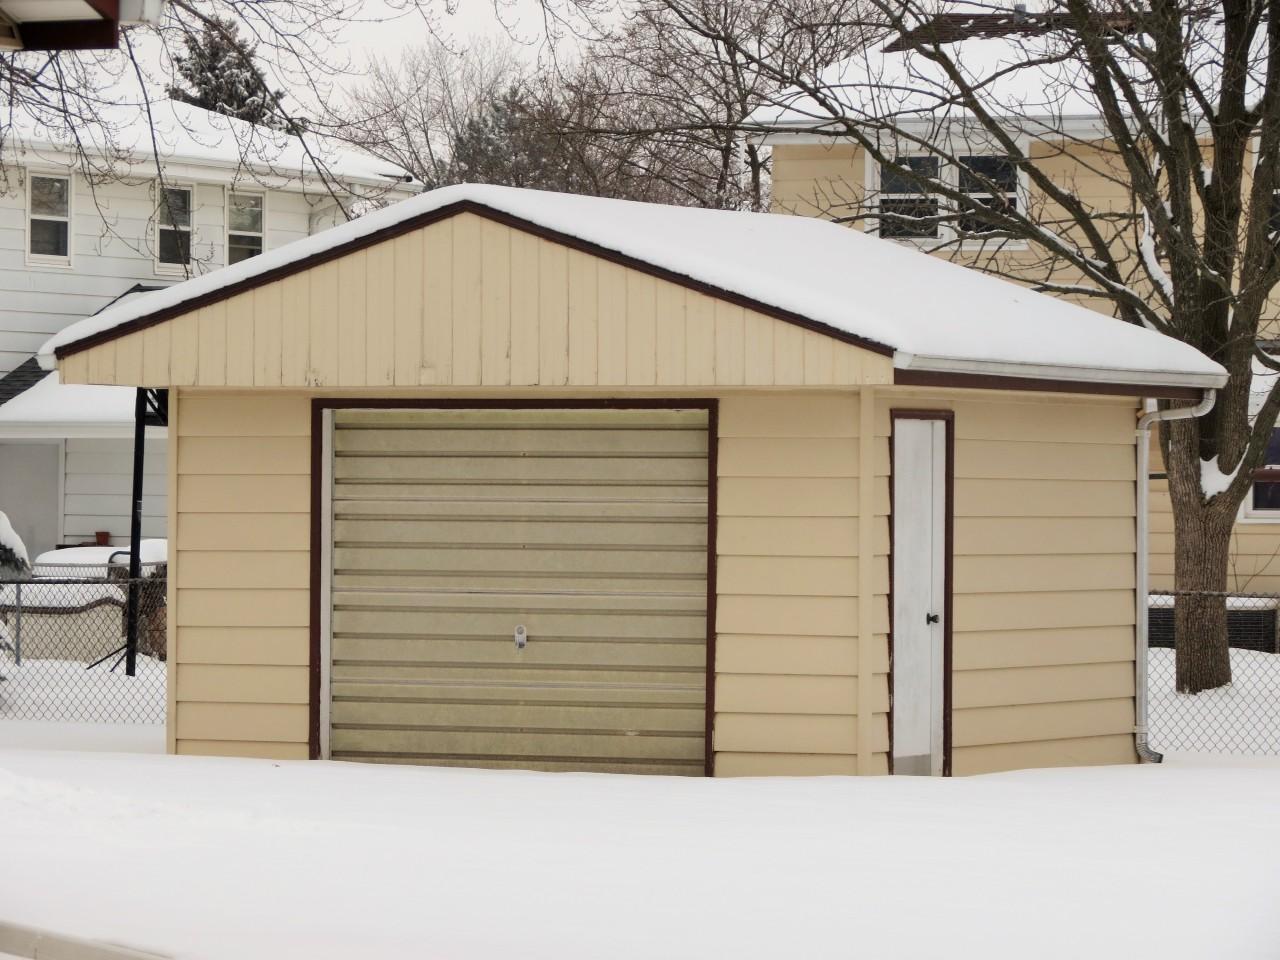 721 Sheridan Dr, West Bend, Wisconsin 53095, 3 Bedrooms Bedrooms, 6 Rooms Rooms,1 BathroomBathrooms,Single-family,For Sale,Sheridan Dr,1723106